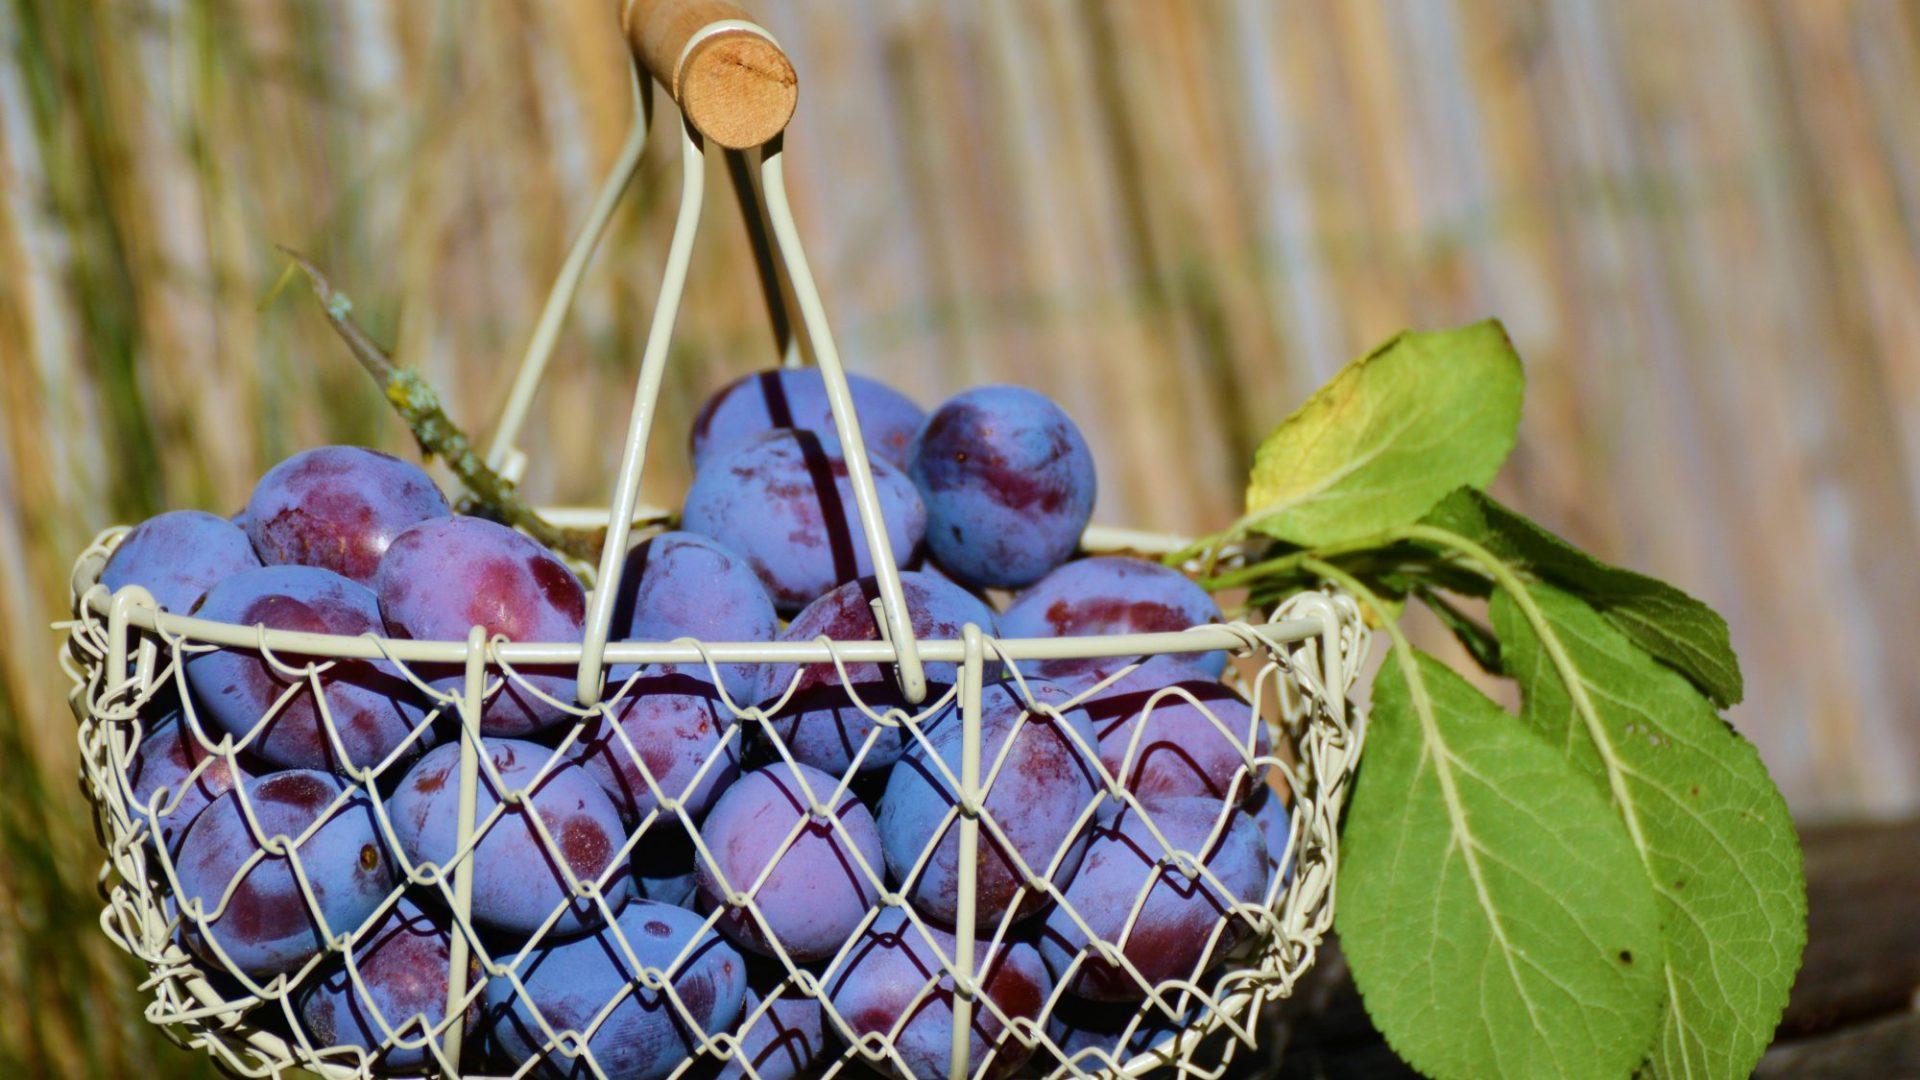 plums-1649602